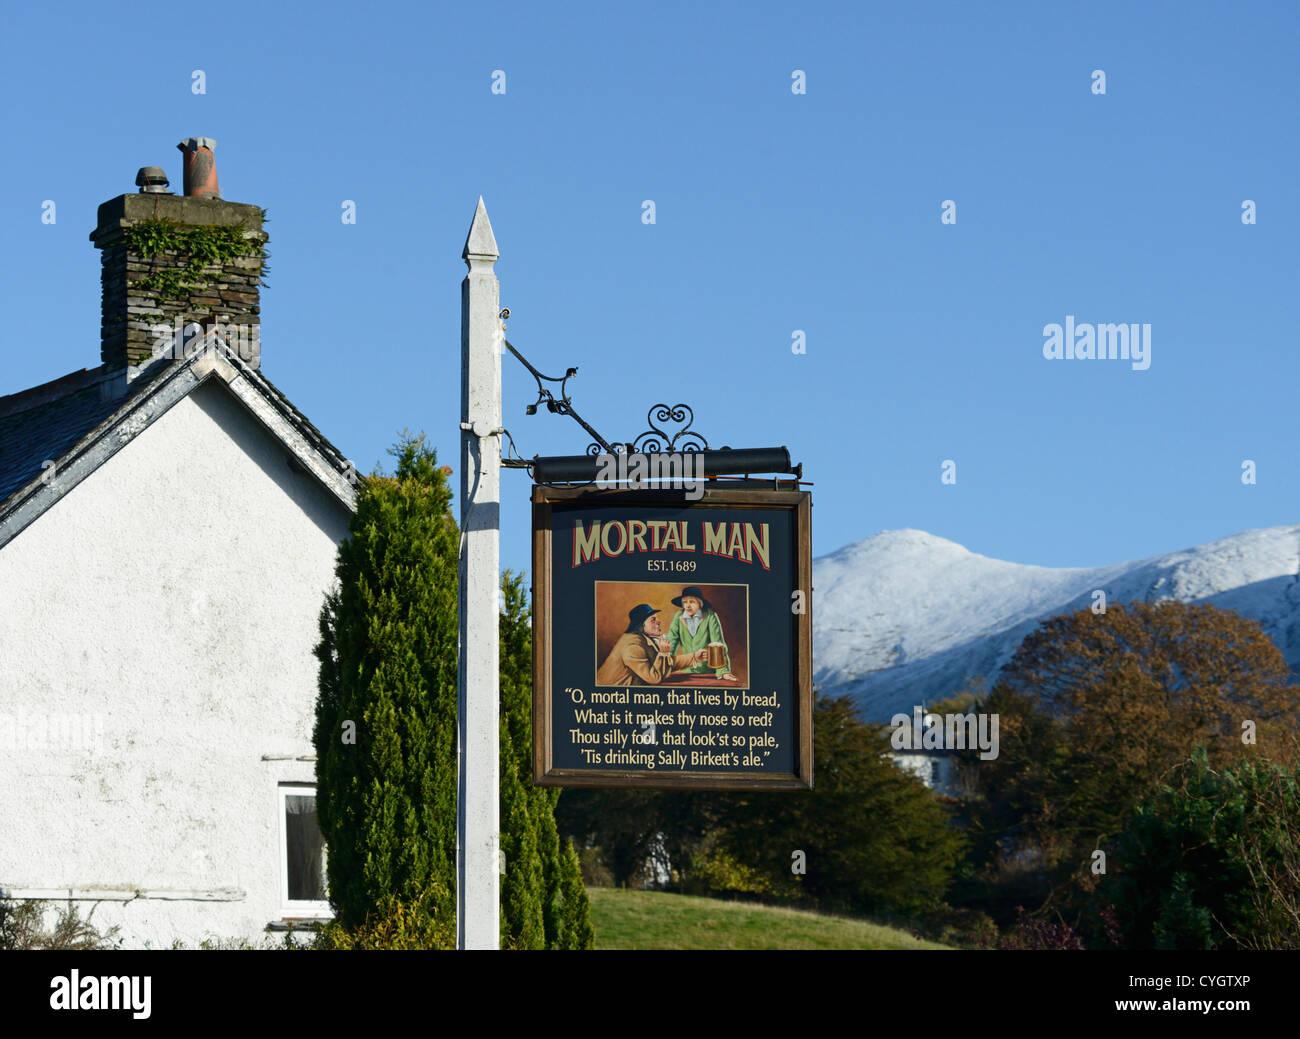 Inn sign, The Mortal Man Inn. Troutbeck, Lake District National Park, Cumbria, England, United Kingdom, Europe. - Stock Image